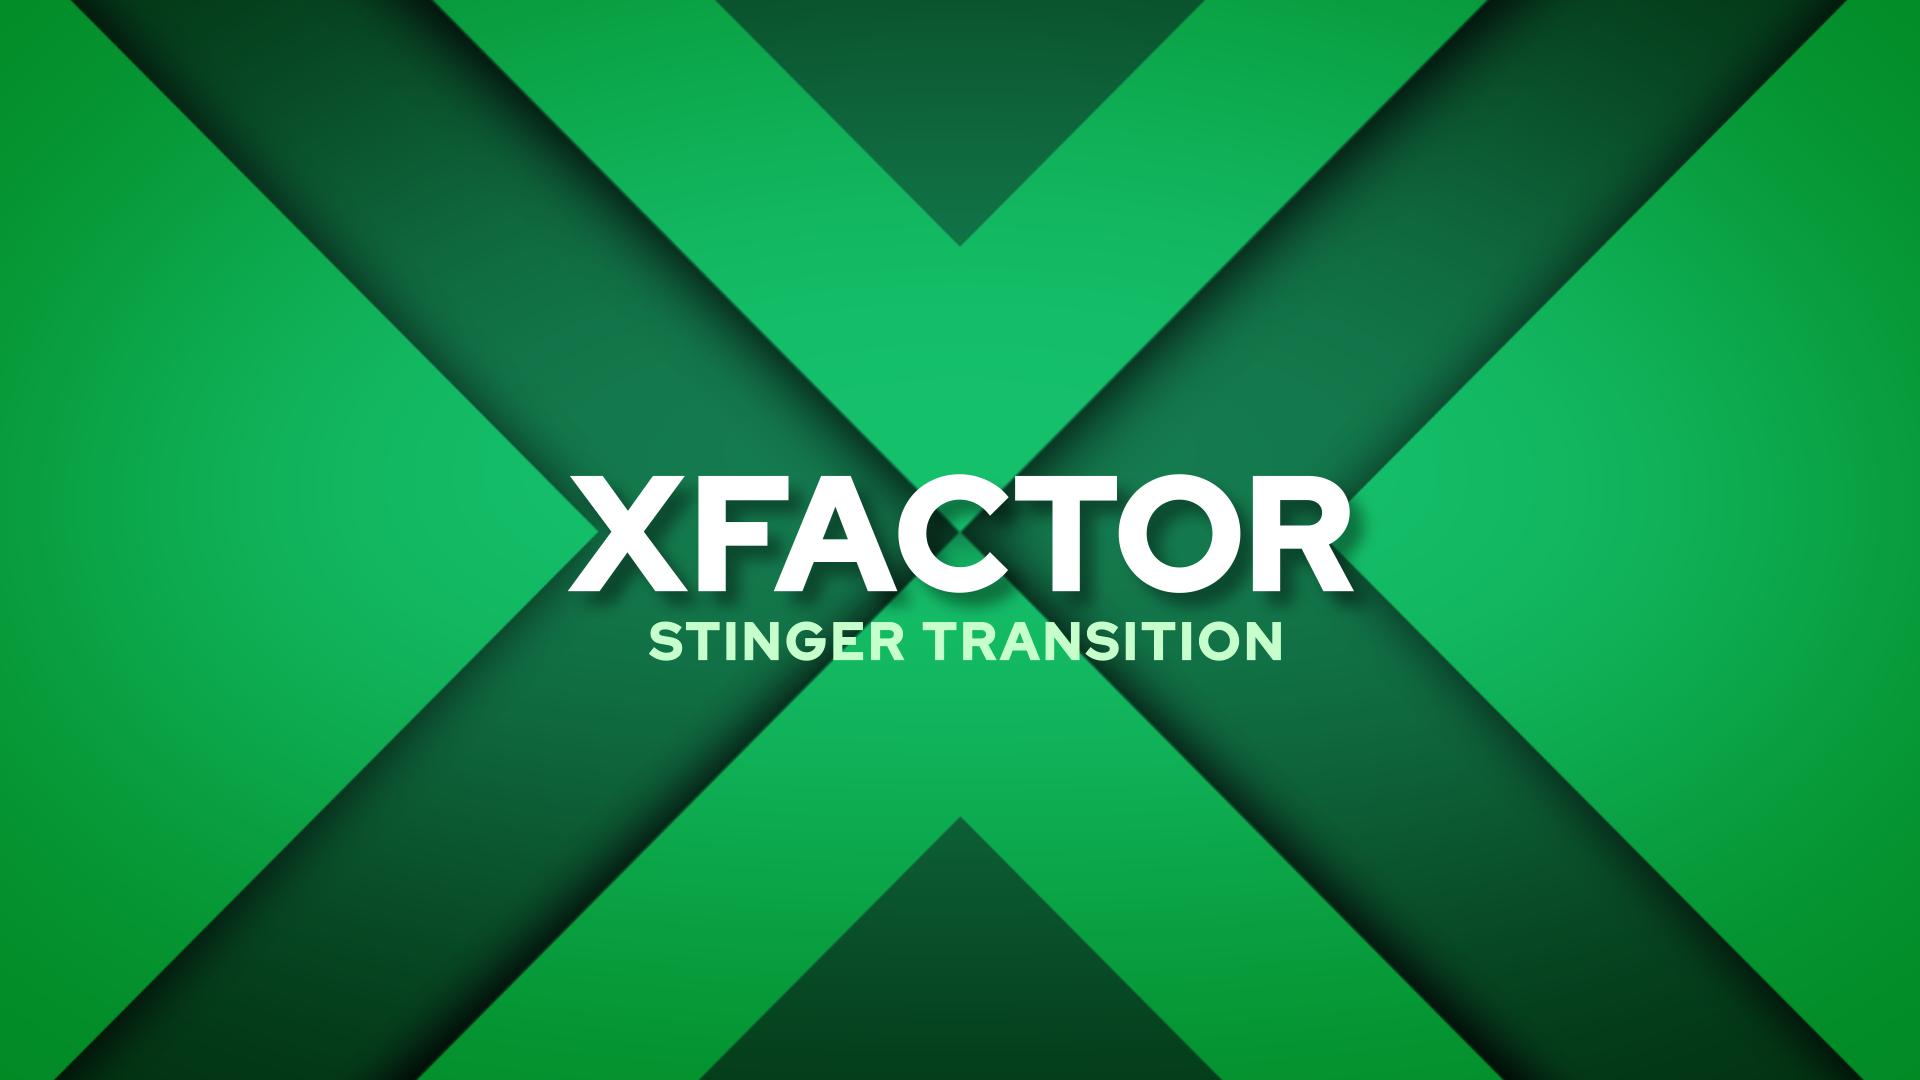 X Factor Stinger Transition